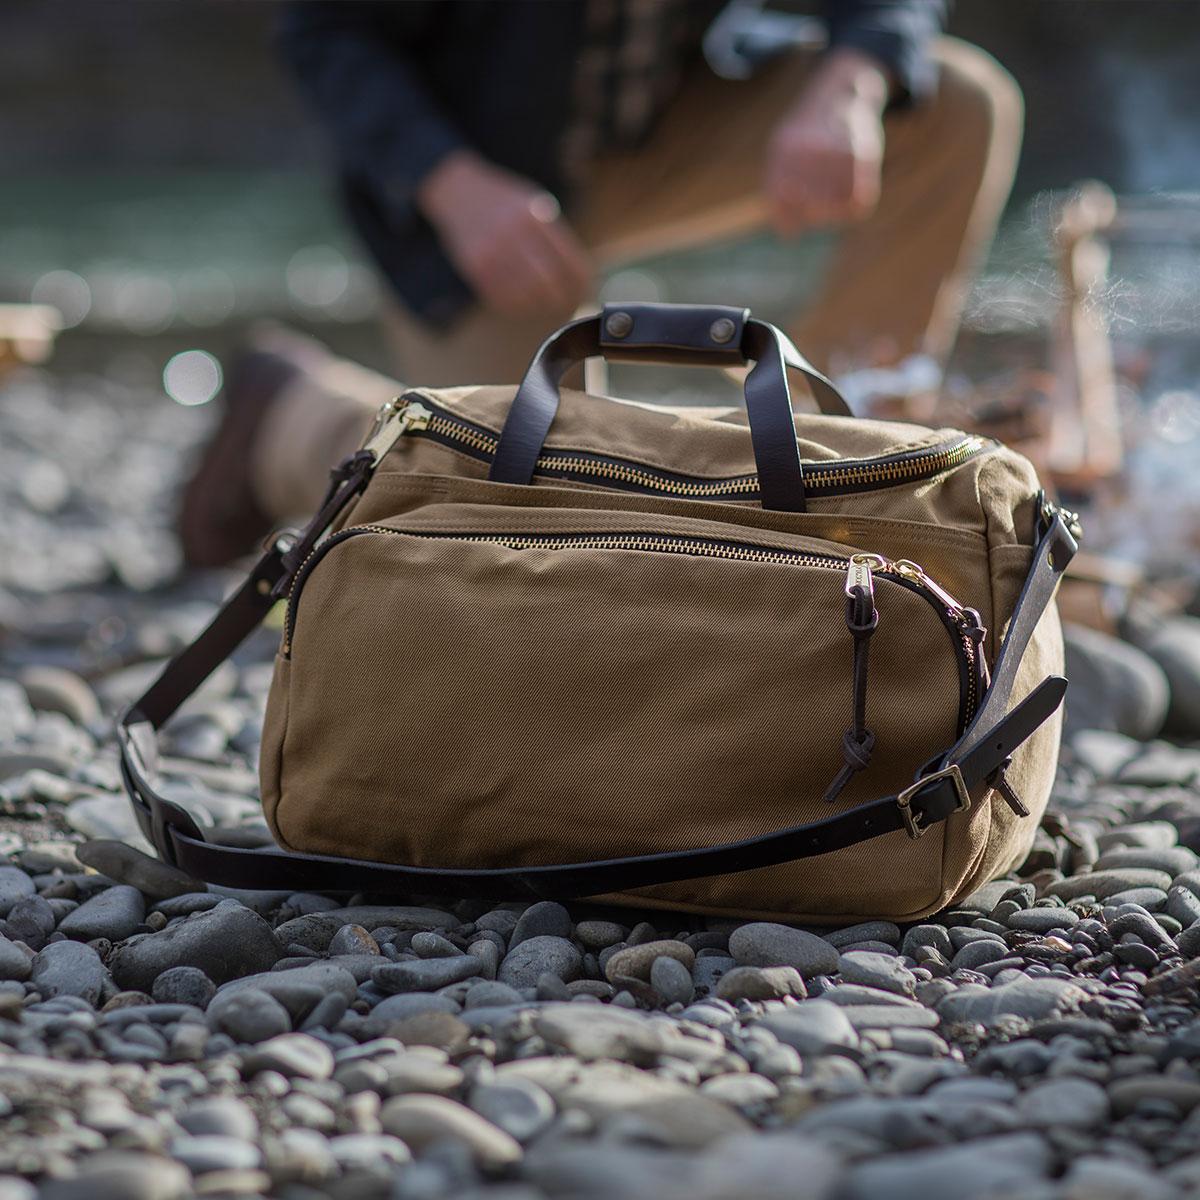 Filson Sportsman Utility Bag Tan, versatile Sportsman Bag for travel in style